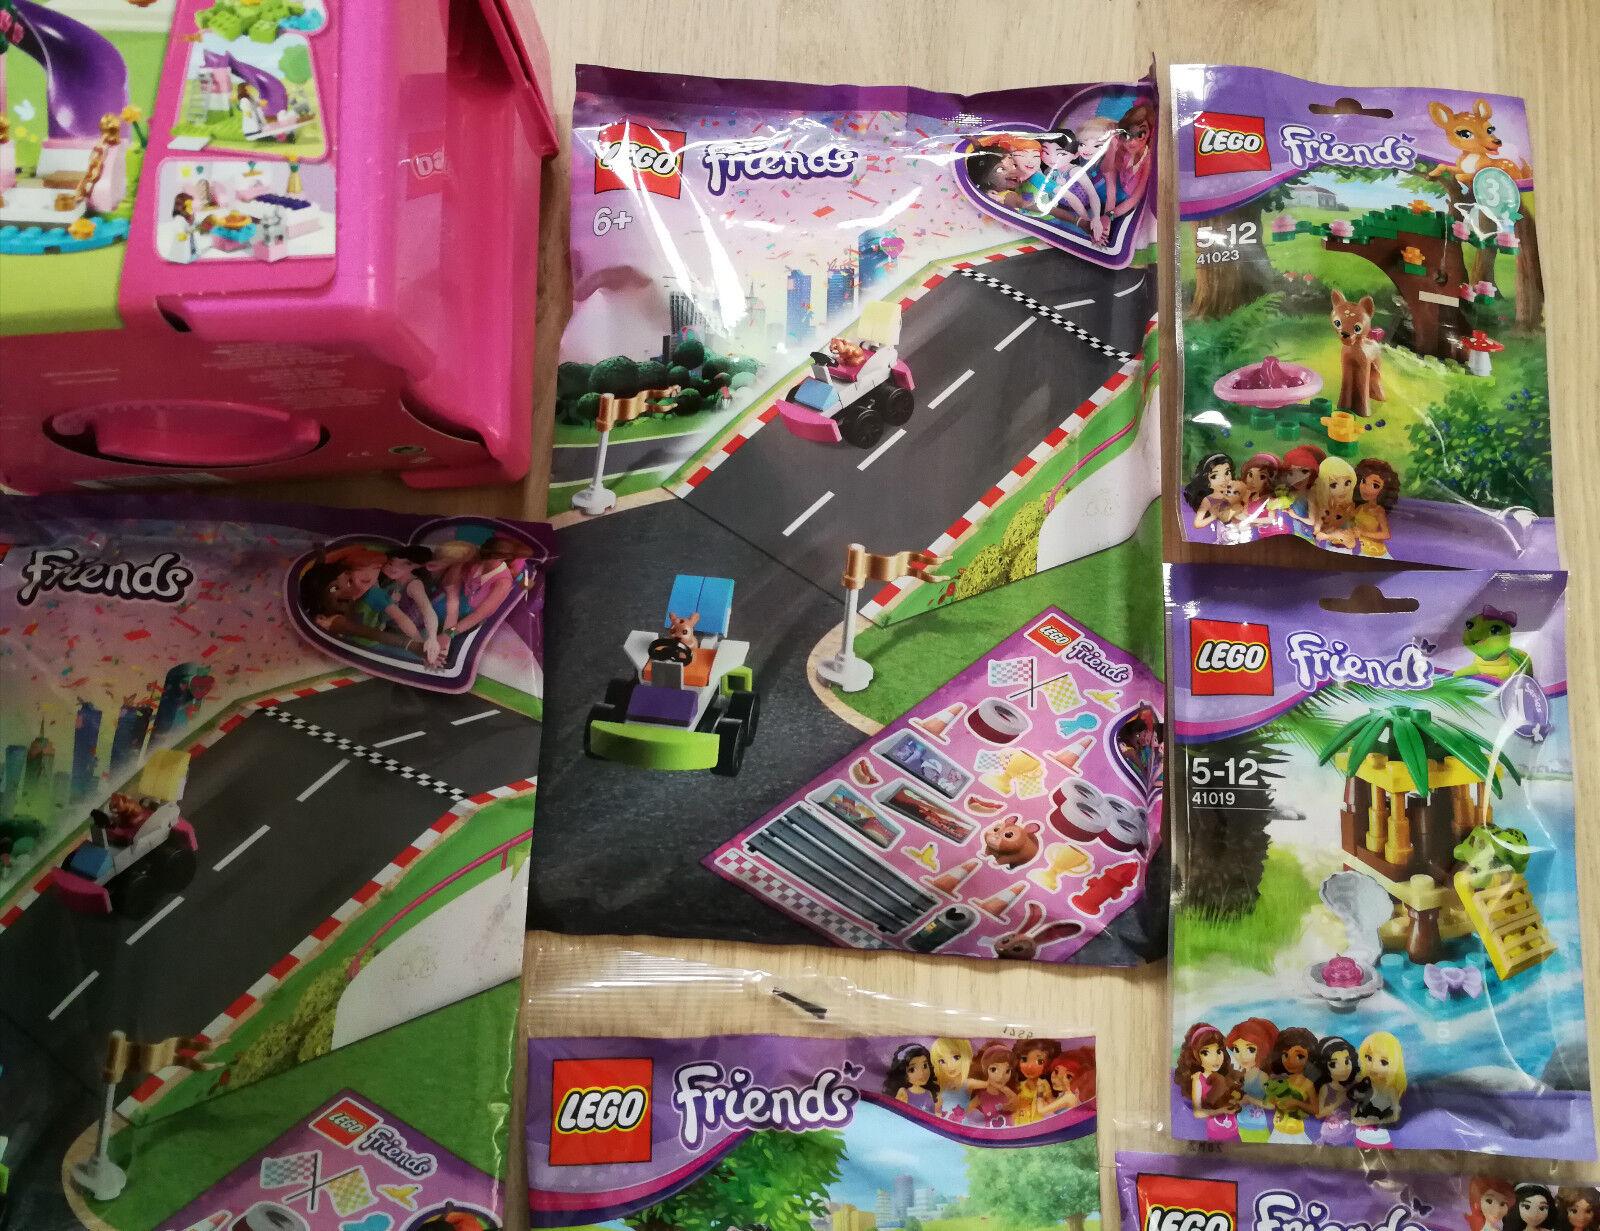 LEGO® Juniors 10668 & Friends 30103 30203 41017 41019 41019 41019 & 2x 5005238 NEU & OVP 22e3d5